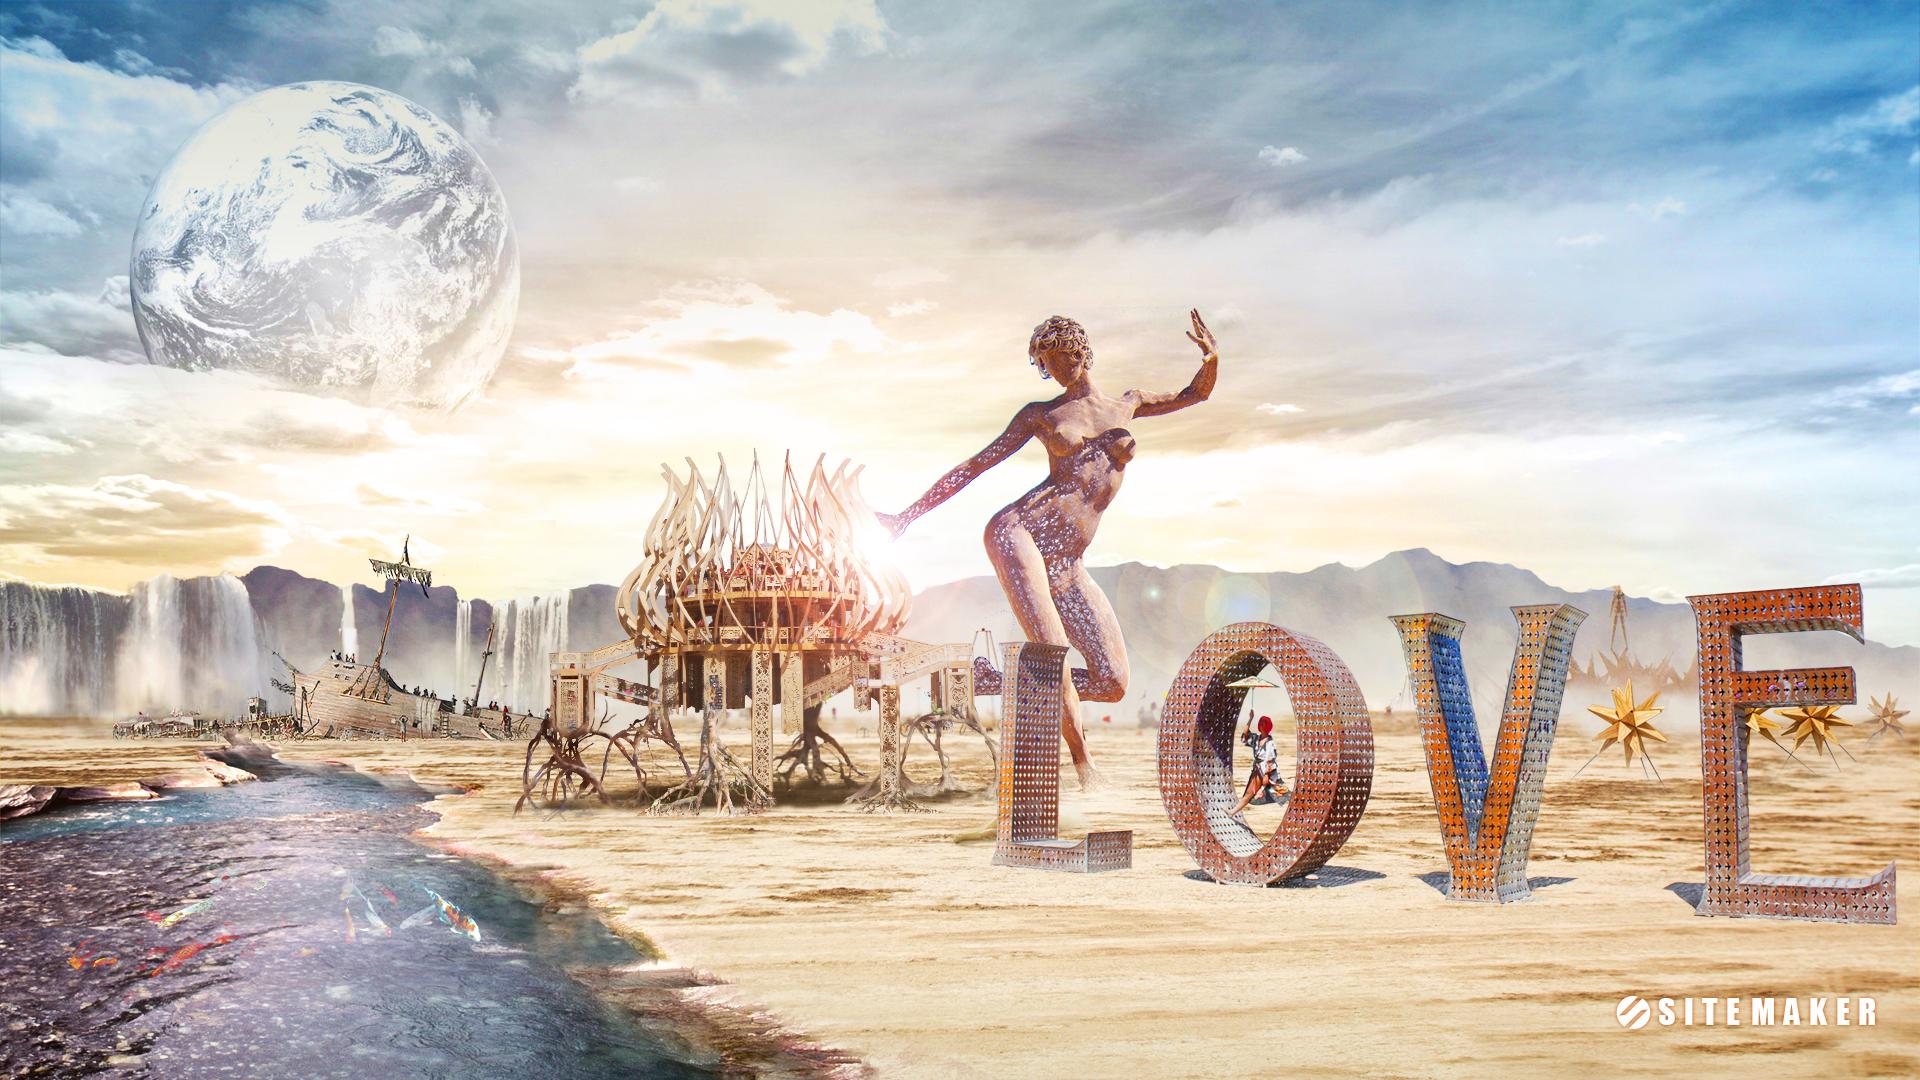 45] Burning Man Wallpaper on WallpaperSafari 1920x1080